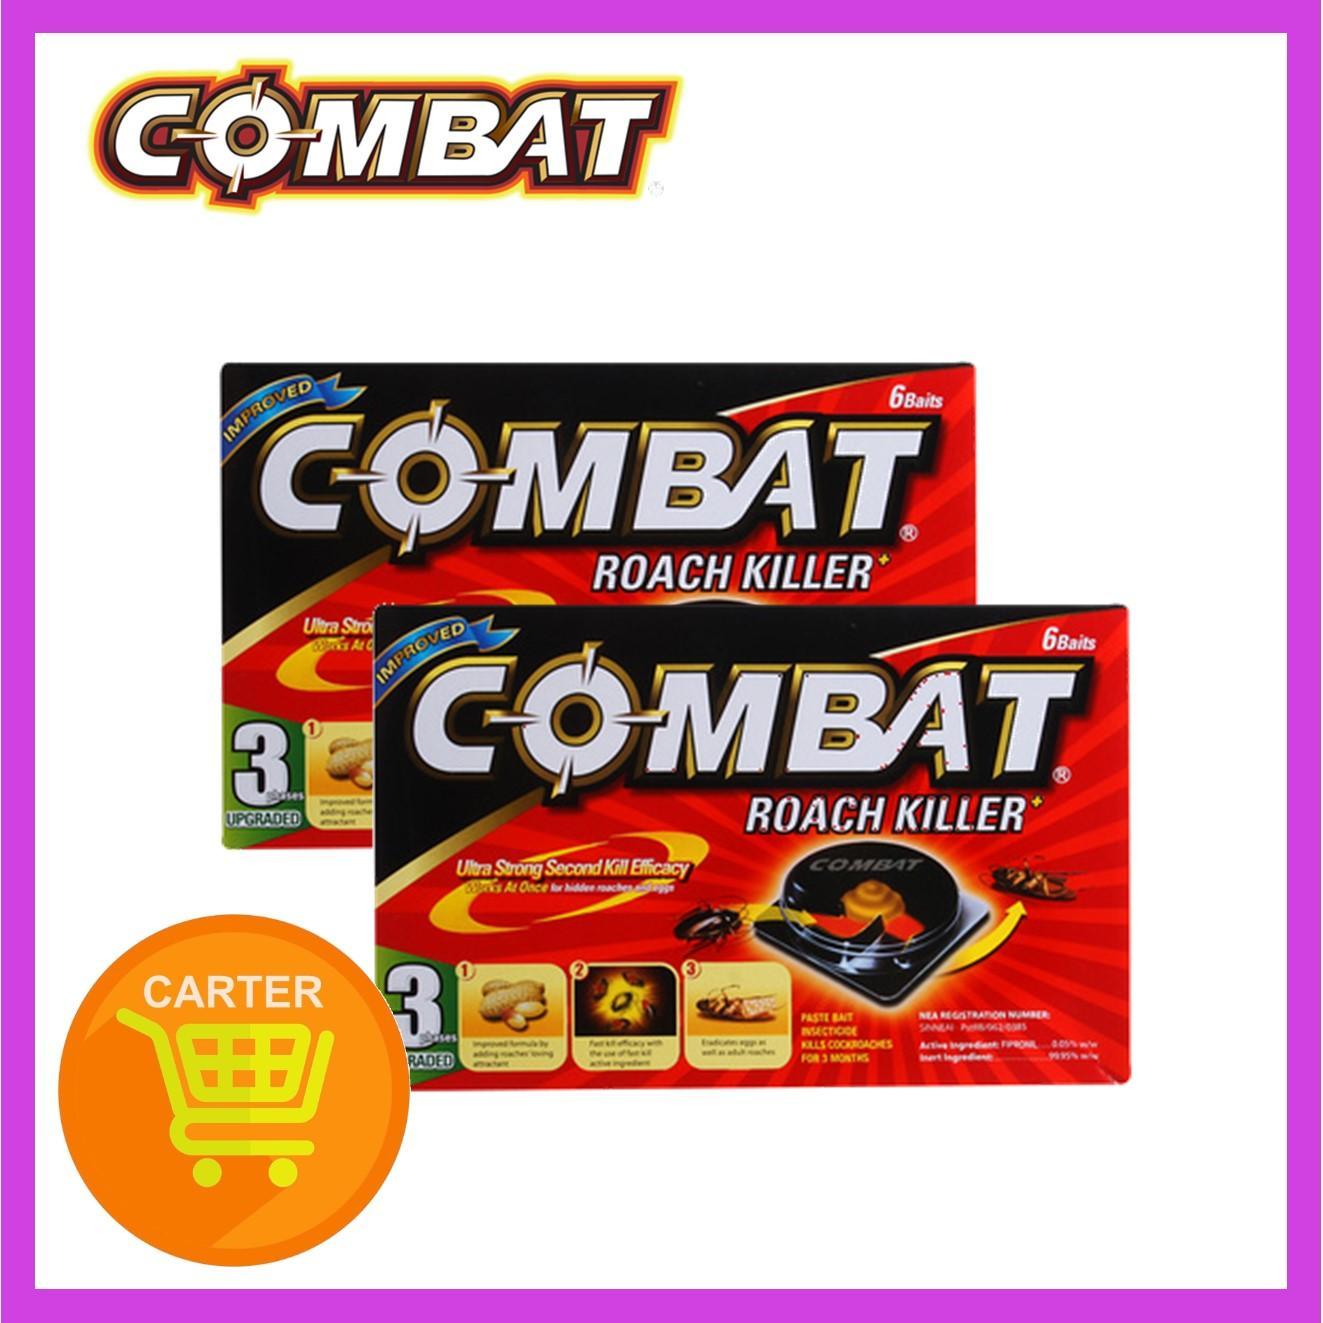 COMBAT ROACH KILLER 6s x (2 Pack)